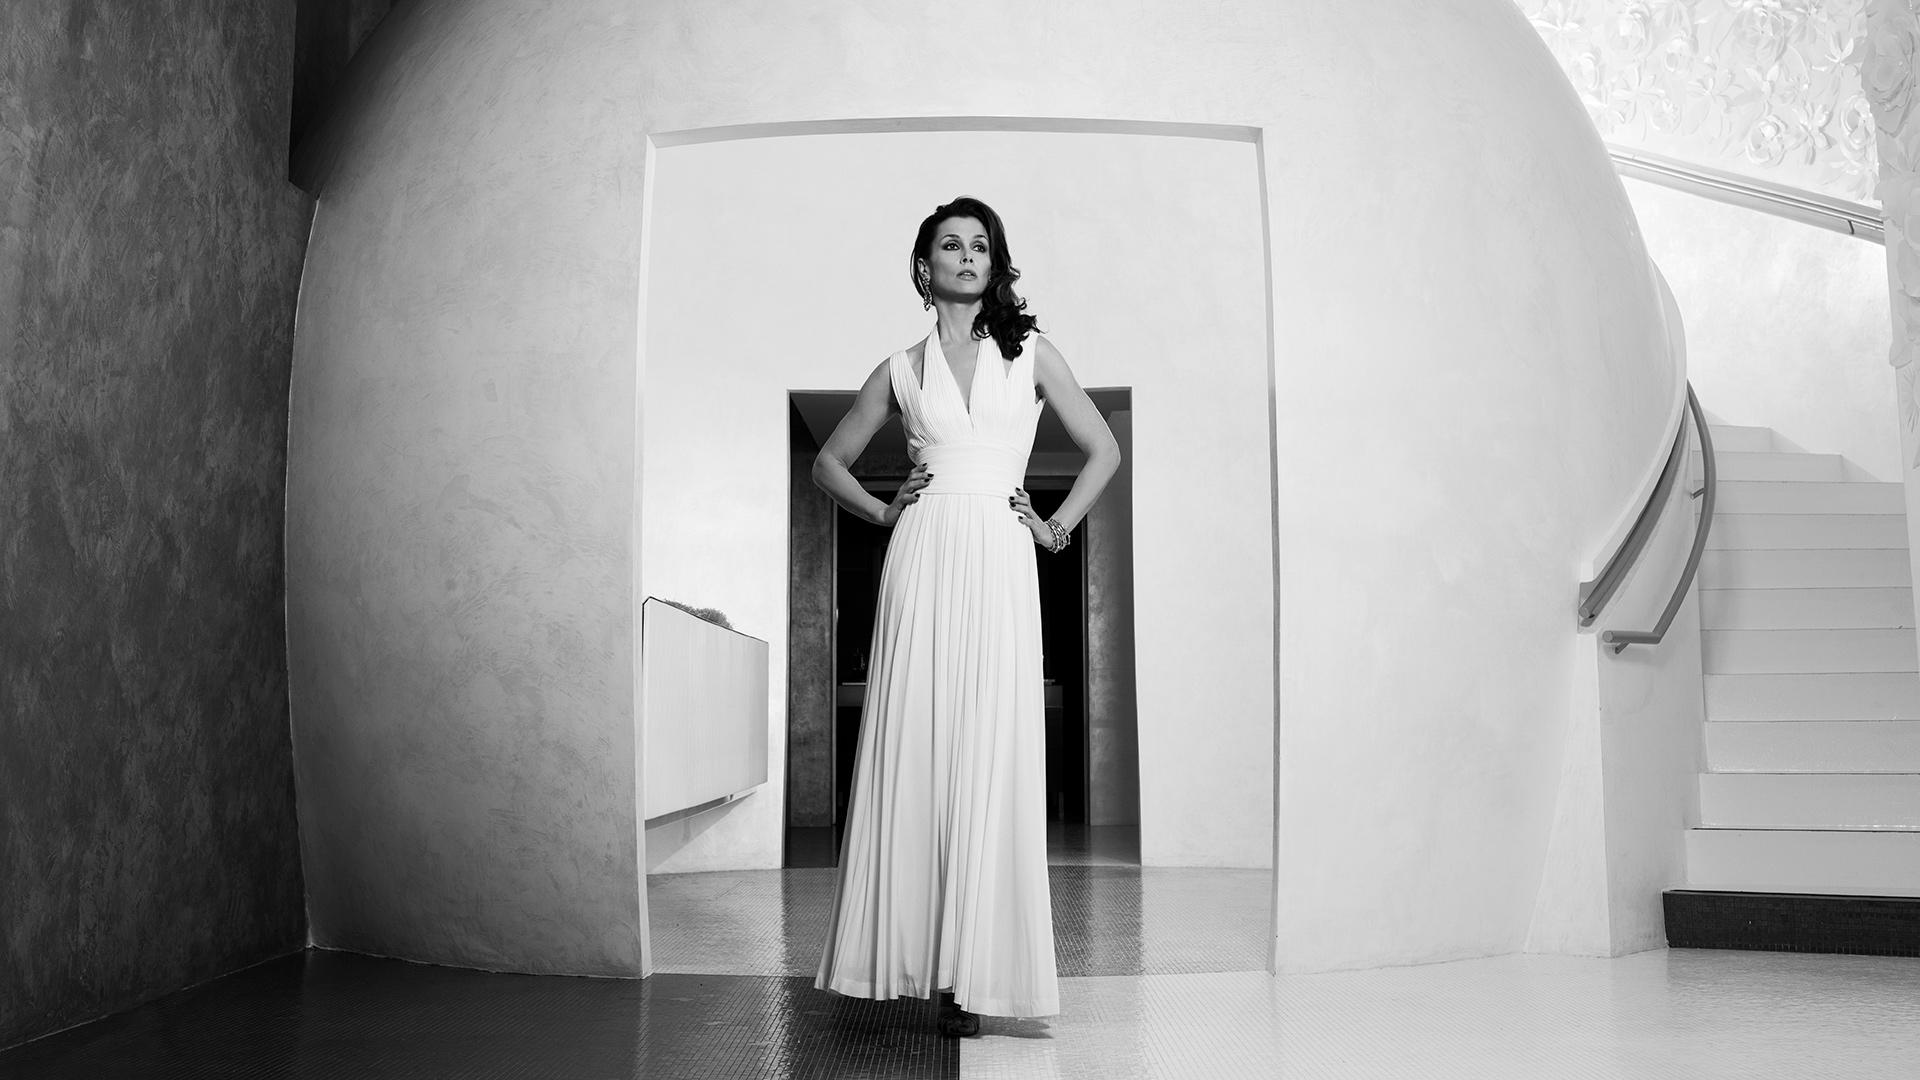 Bridget Moynahan strikes a pose at the Mandarin Oriental in Paris